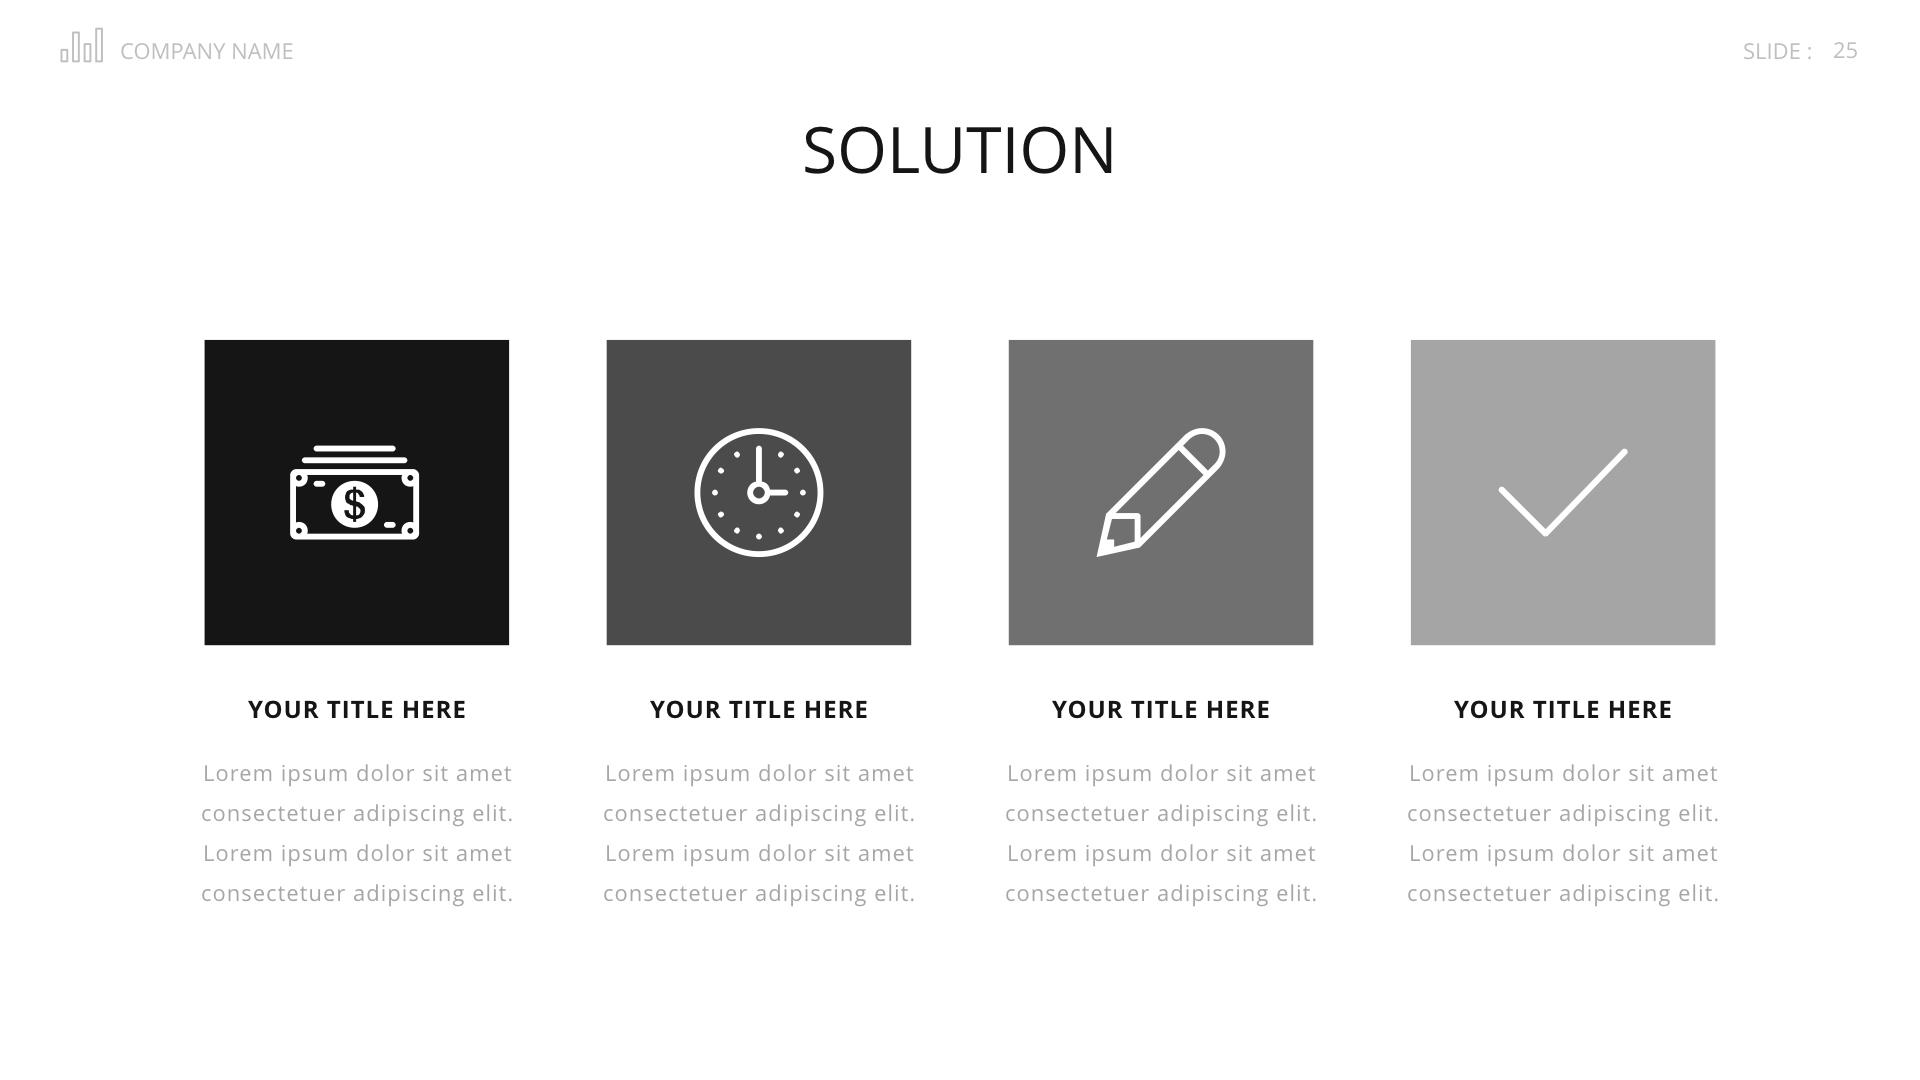 Startup Business Plan Keynote Presenation Template by